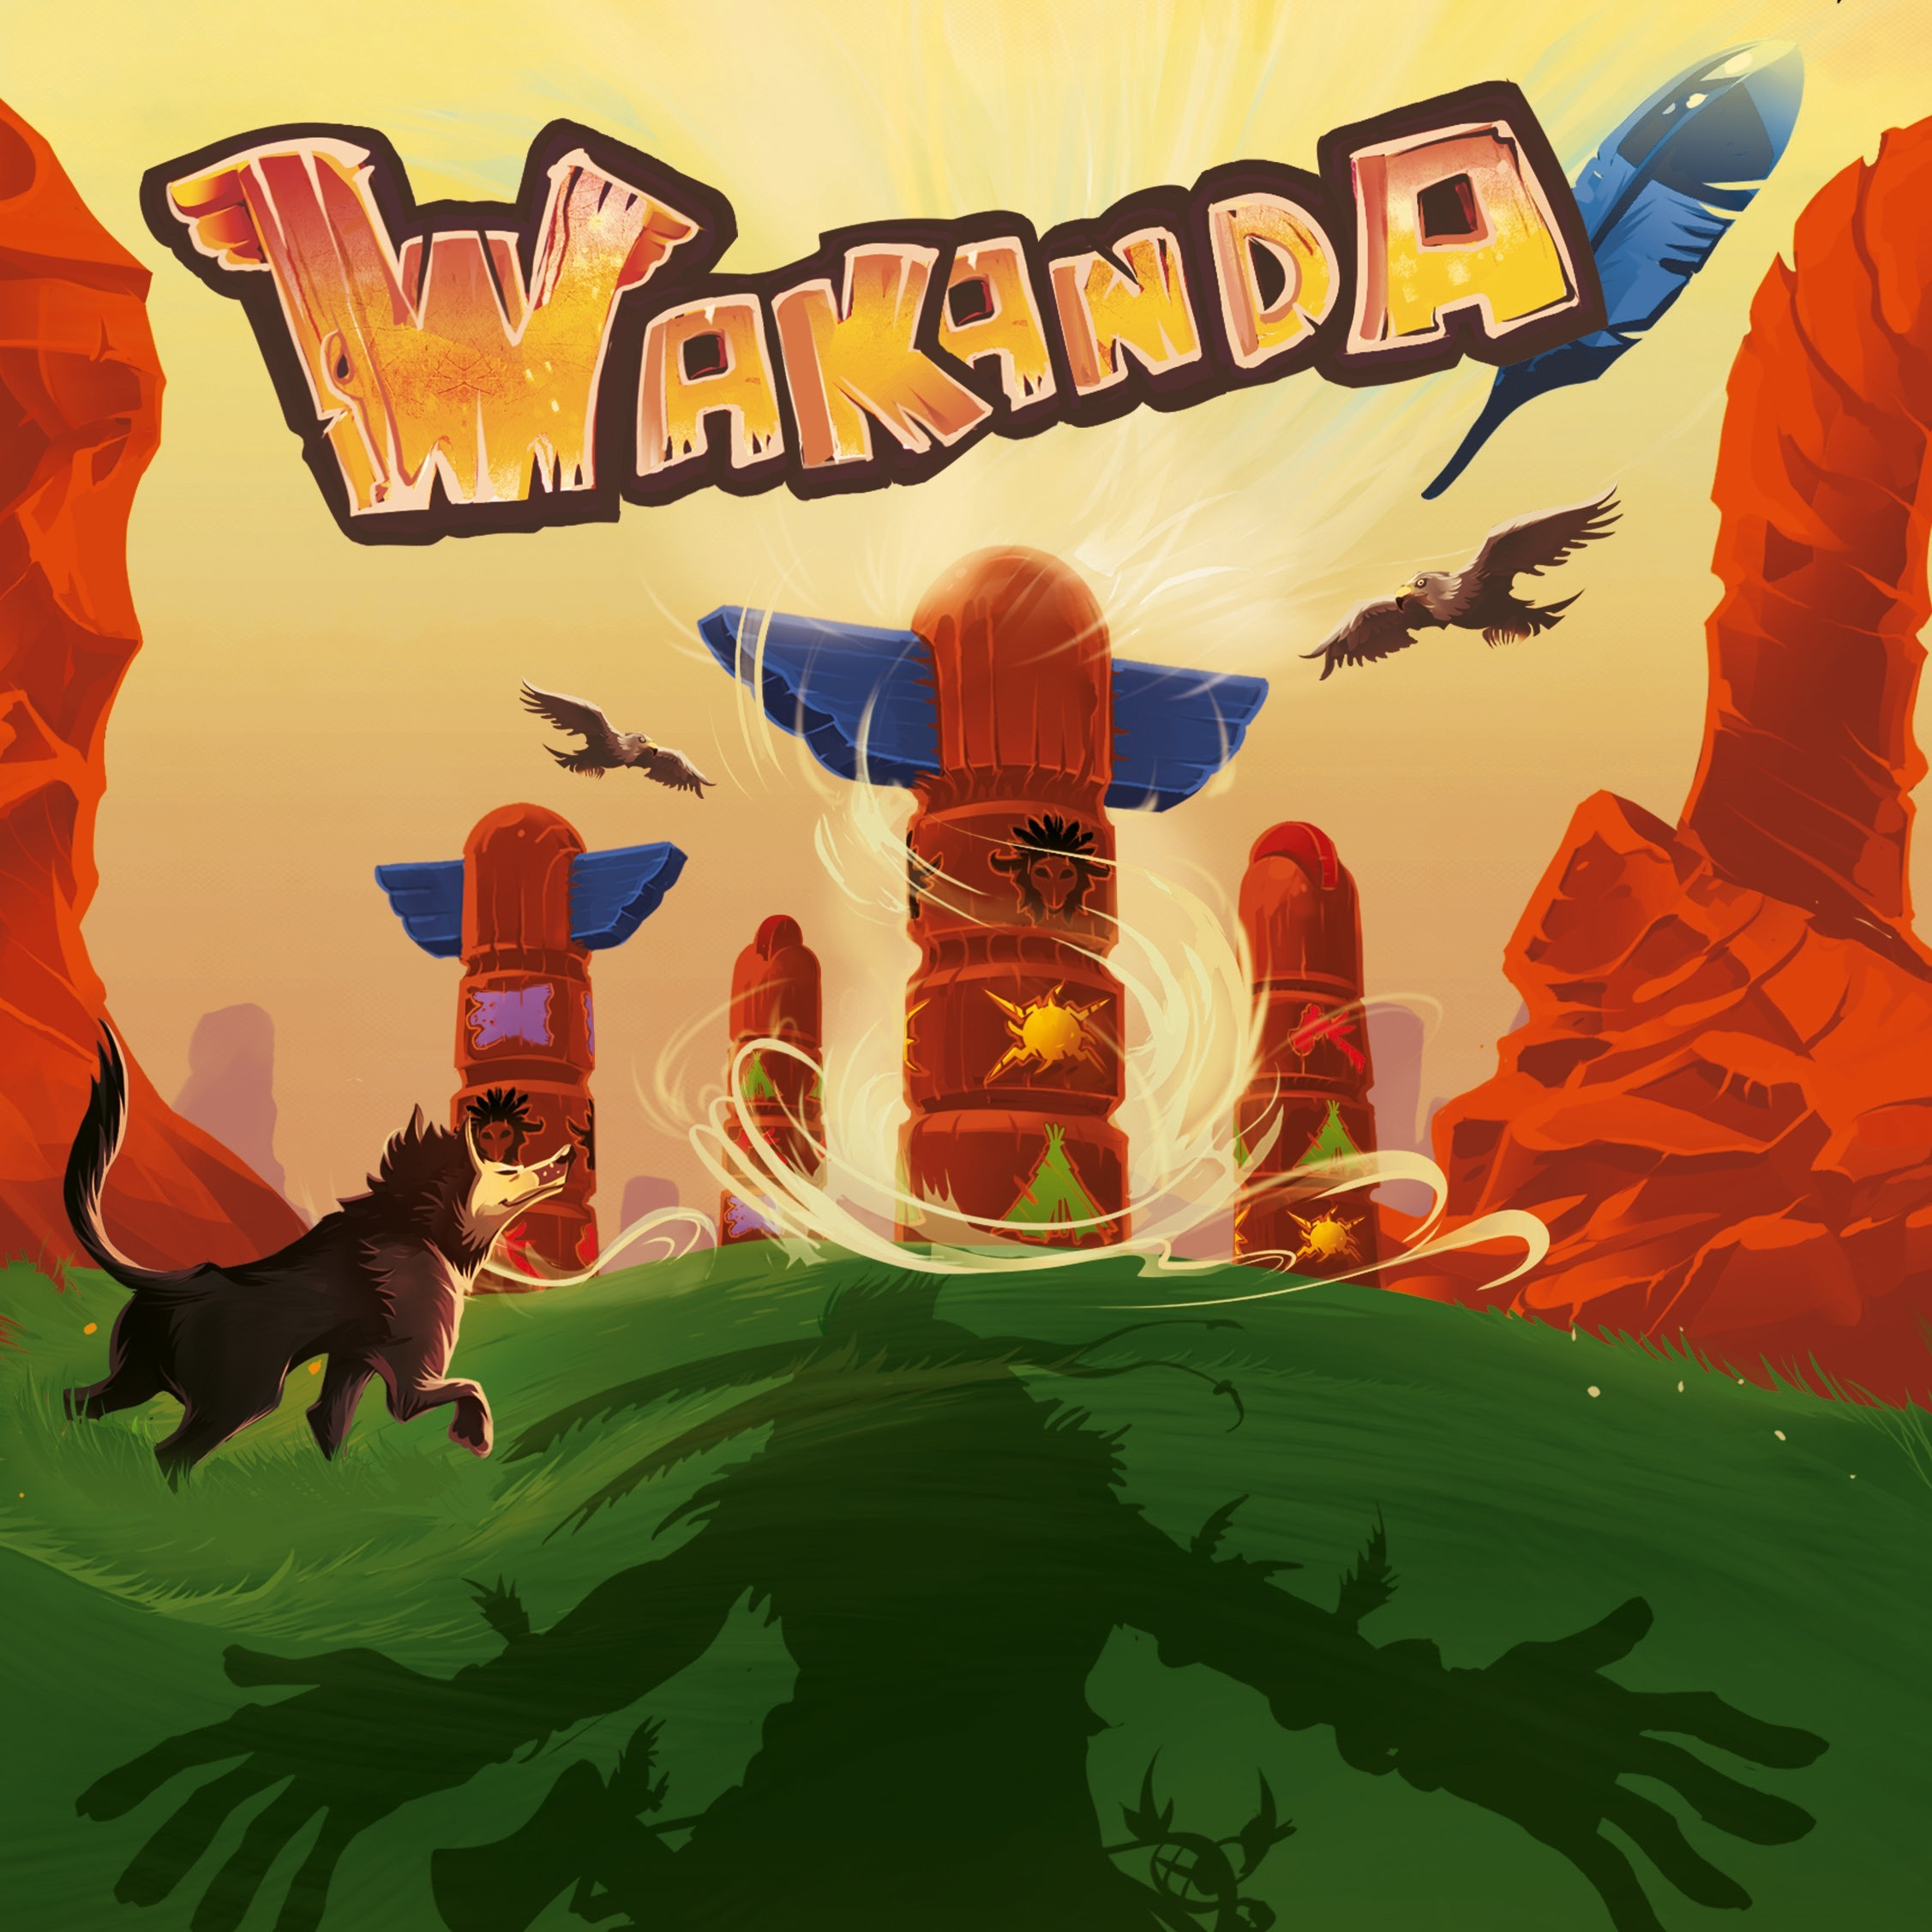 Wakanda, totems sans tabous